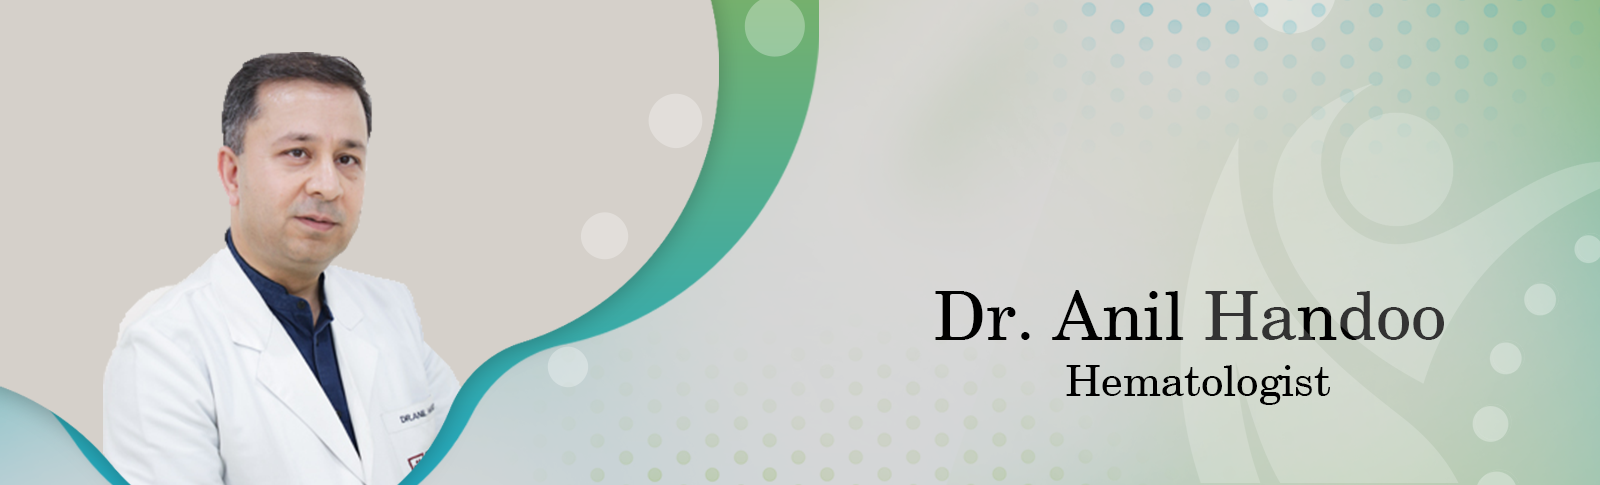 Dr. Anil Handoo